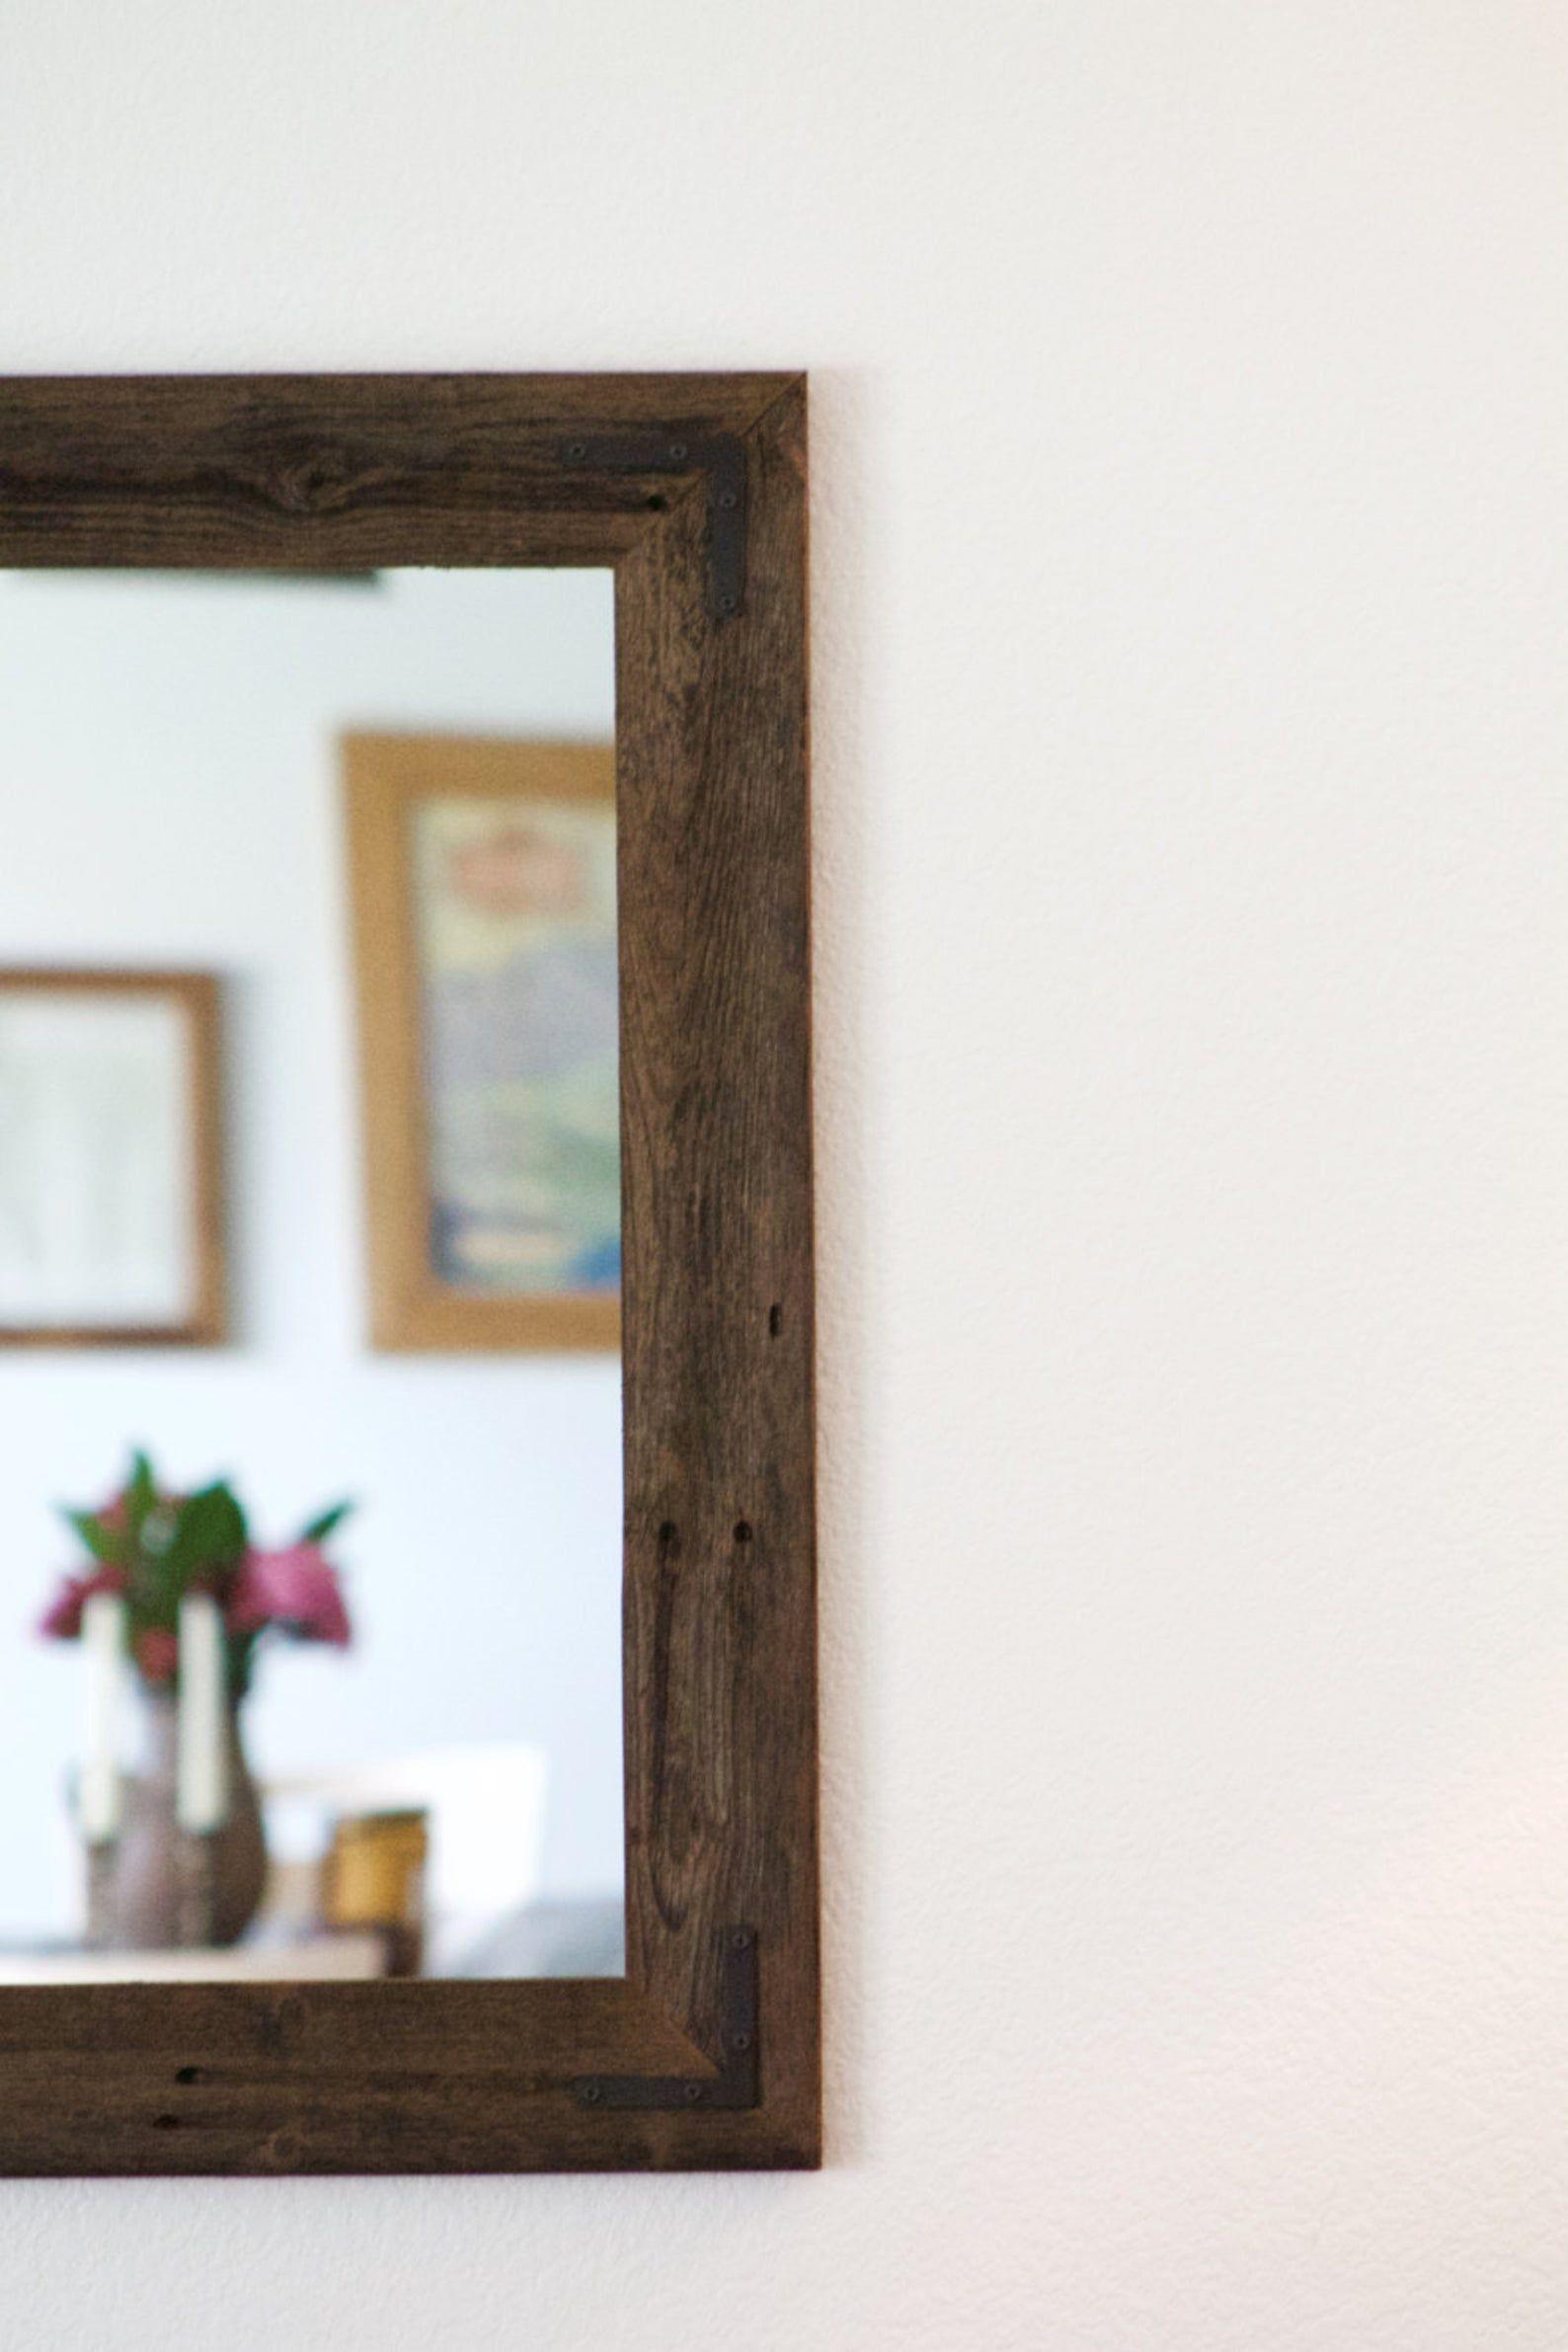 Reclaimed Wood Floor Mirror Extra Large Wood Floors Reclaimed Wood Floors Reclaimed Wood Mirror